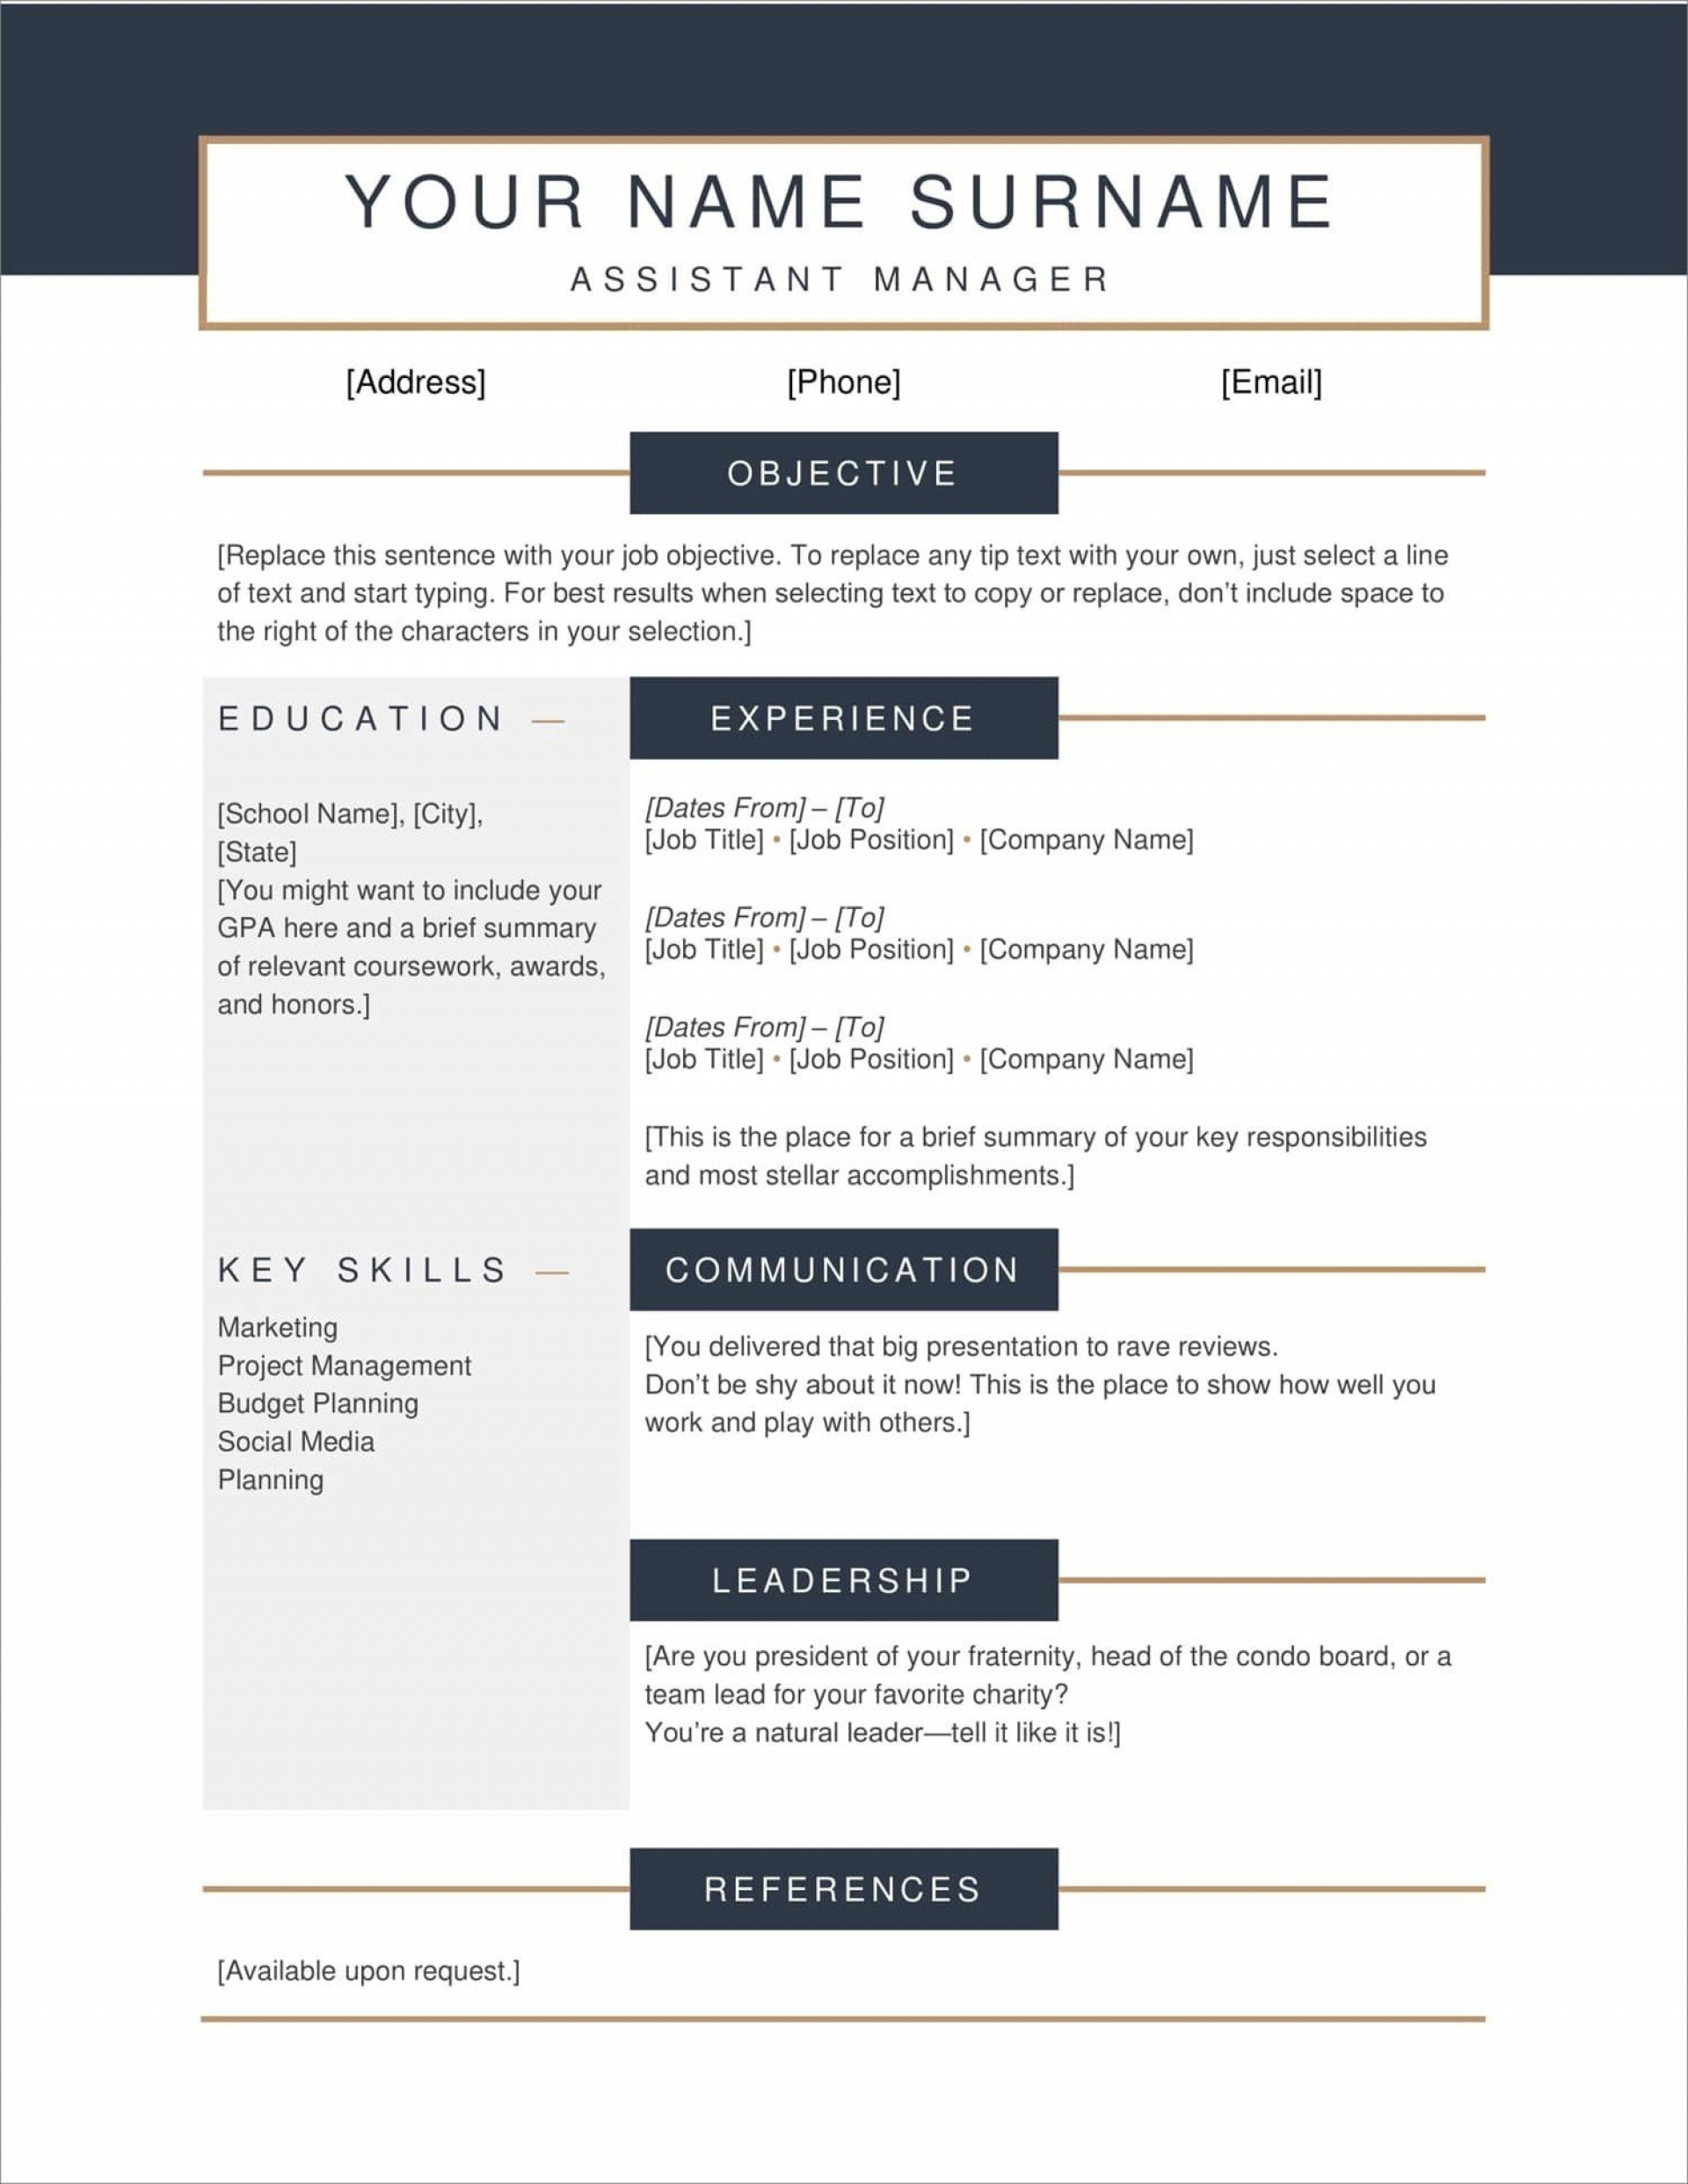 004 Rare Free Printable Resume Template 2019 Highest Quality 1920